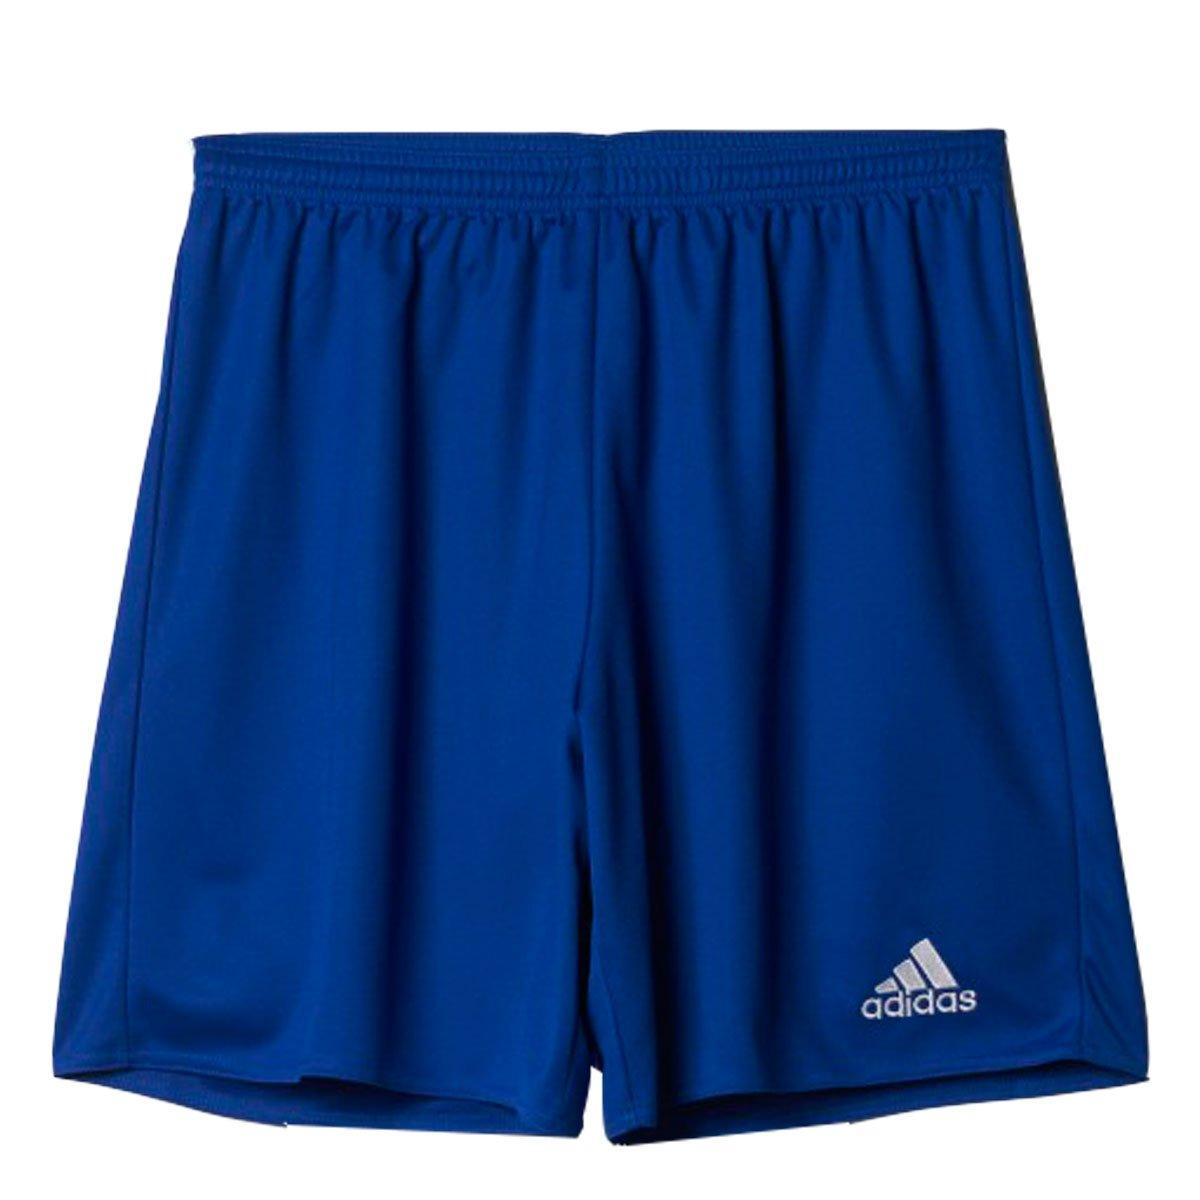 e0aaa5bfb0a7b Bizz Store - Calção Adulto Esportivo Masculino Adidas Futebol